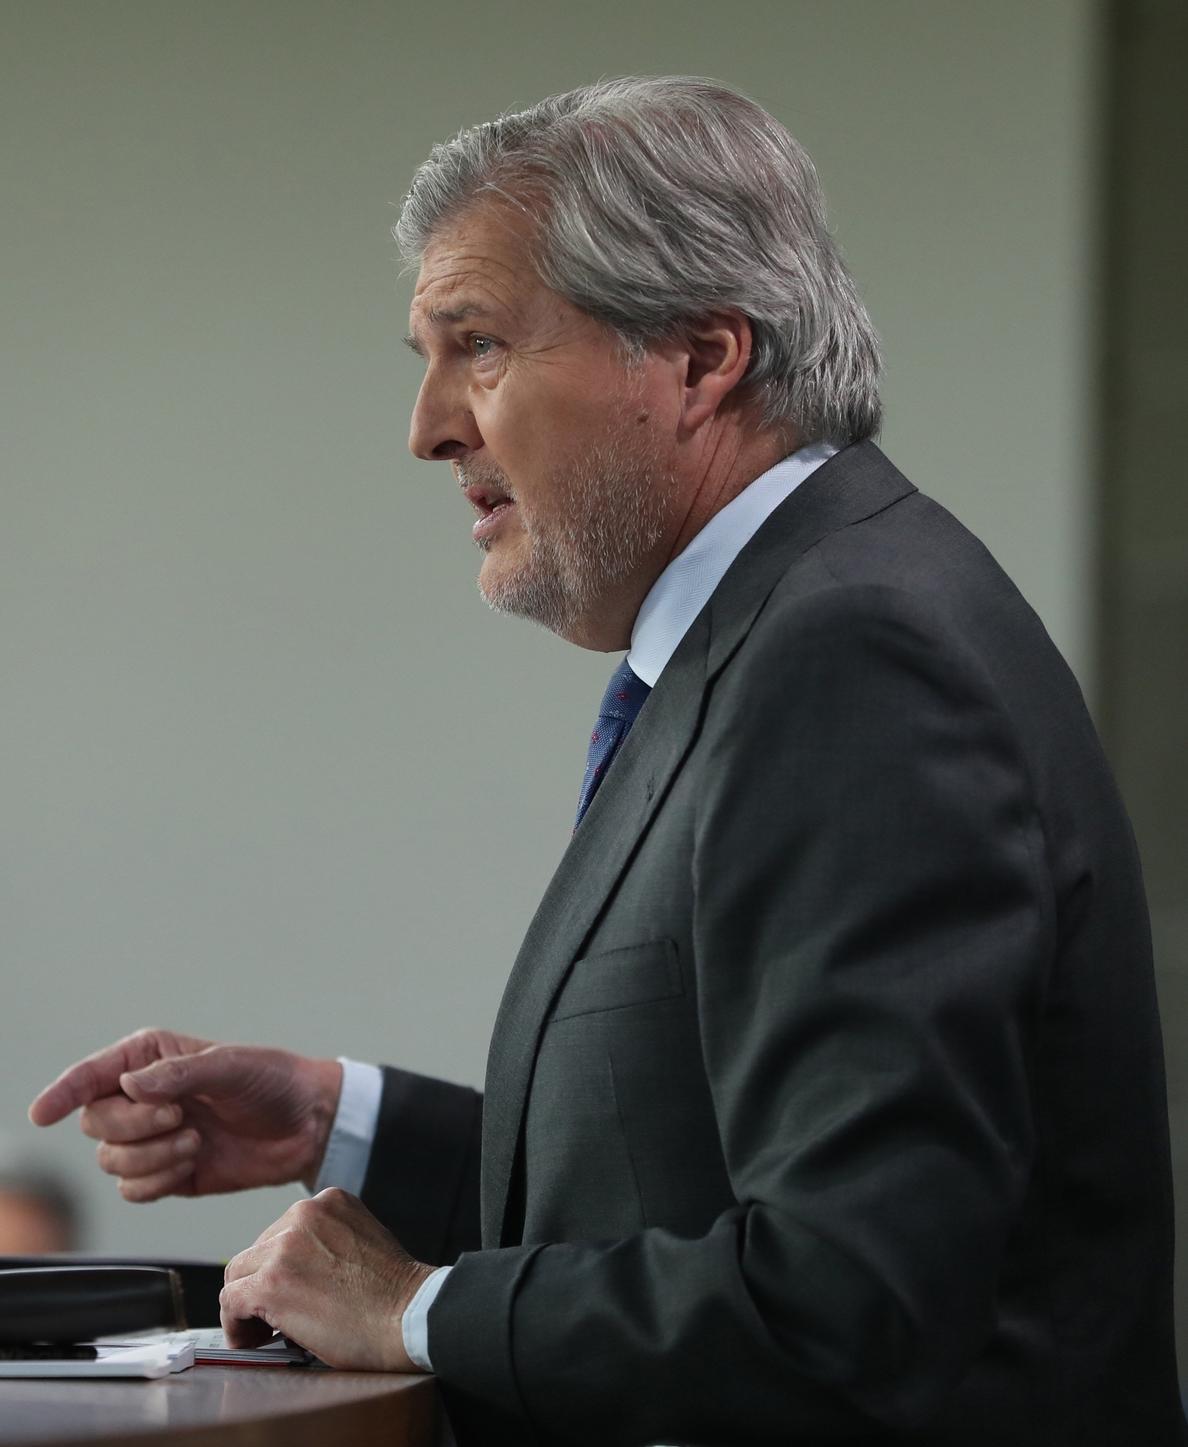 Gobierno: Bélgica quedará impresionado por el estado de cárceles españolas